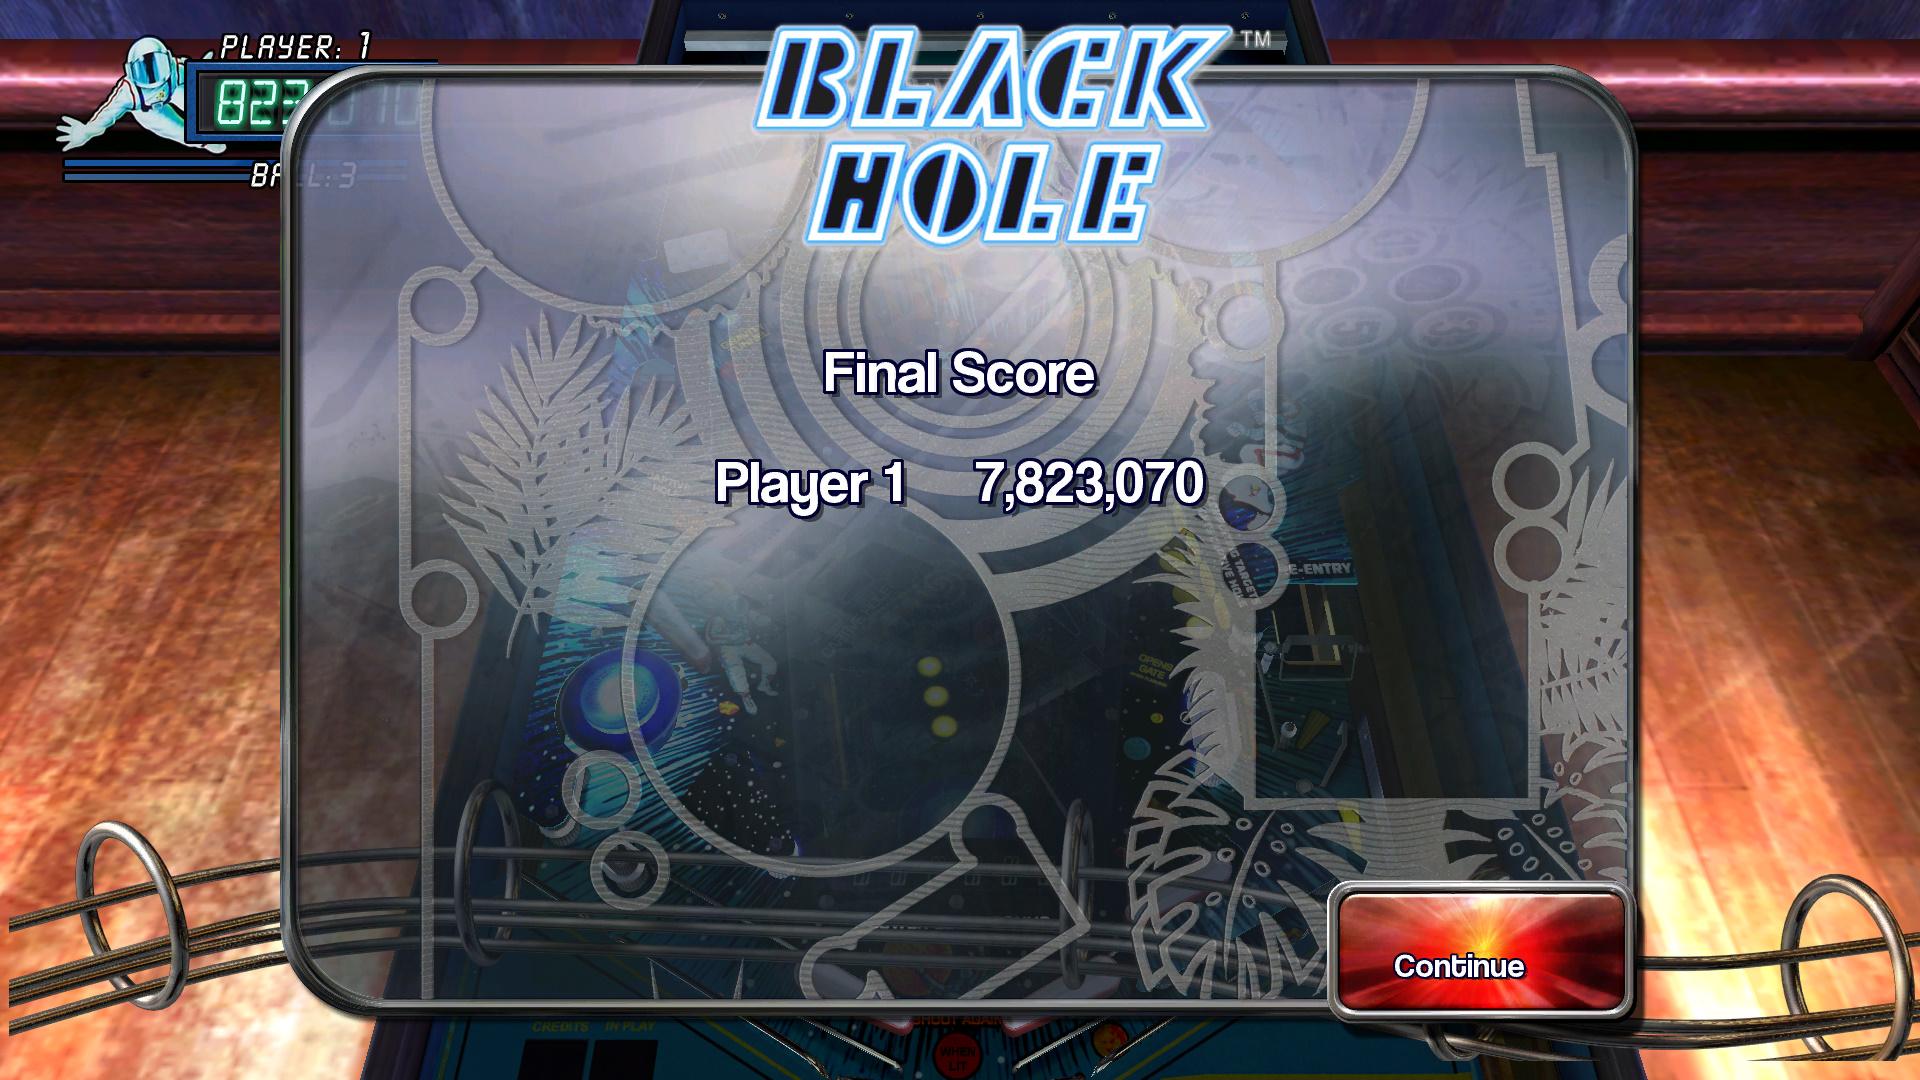 Pinball Arcade: Black Hole 7,823,070 points